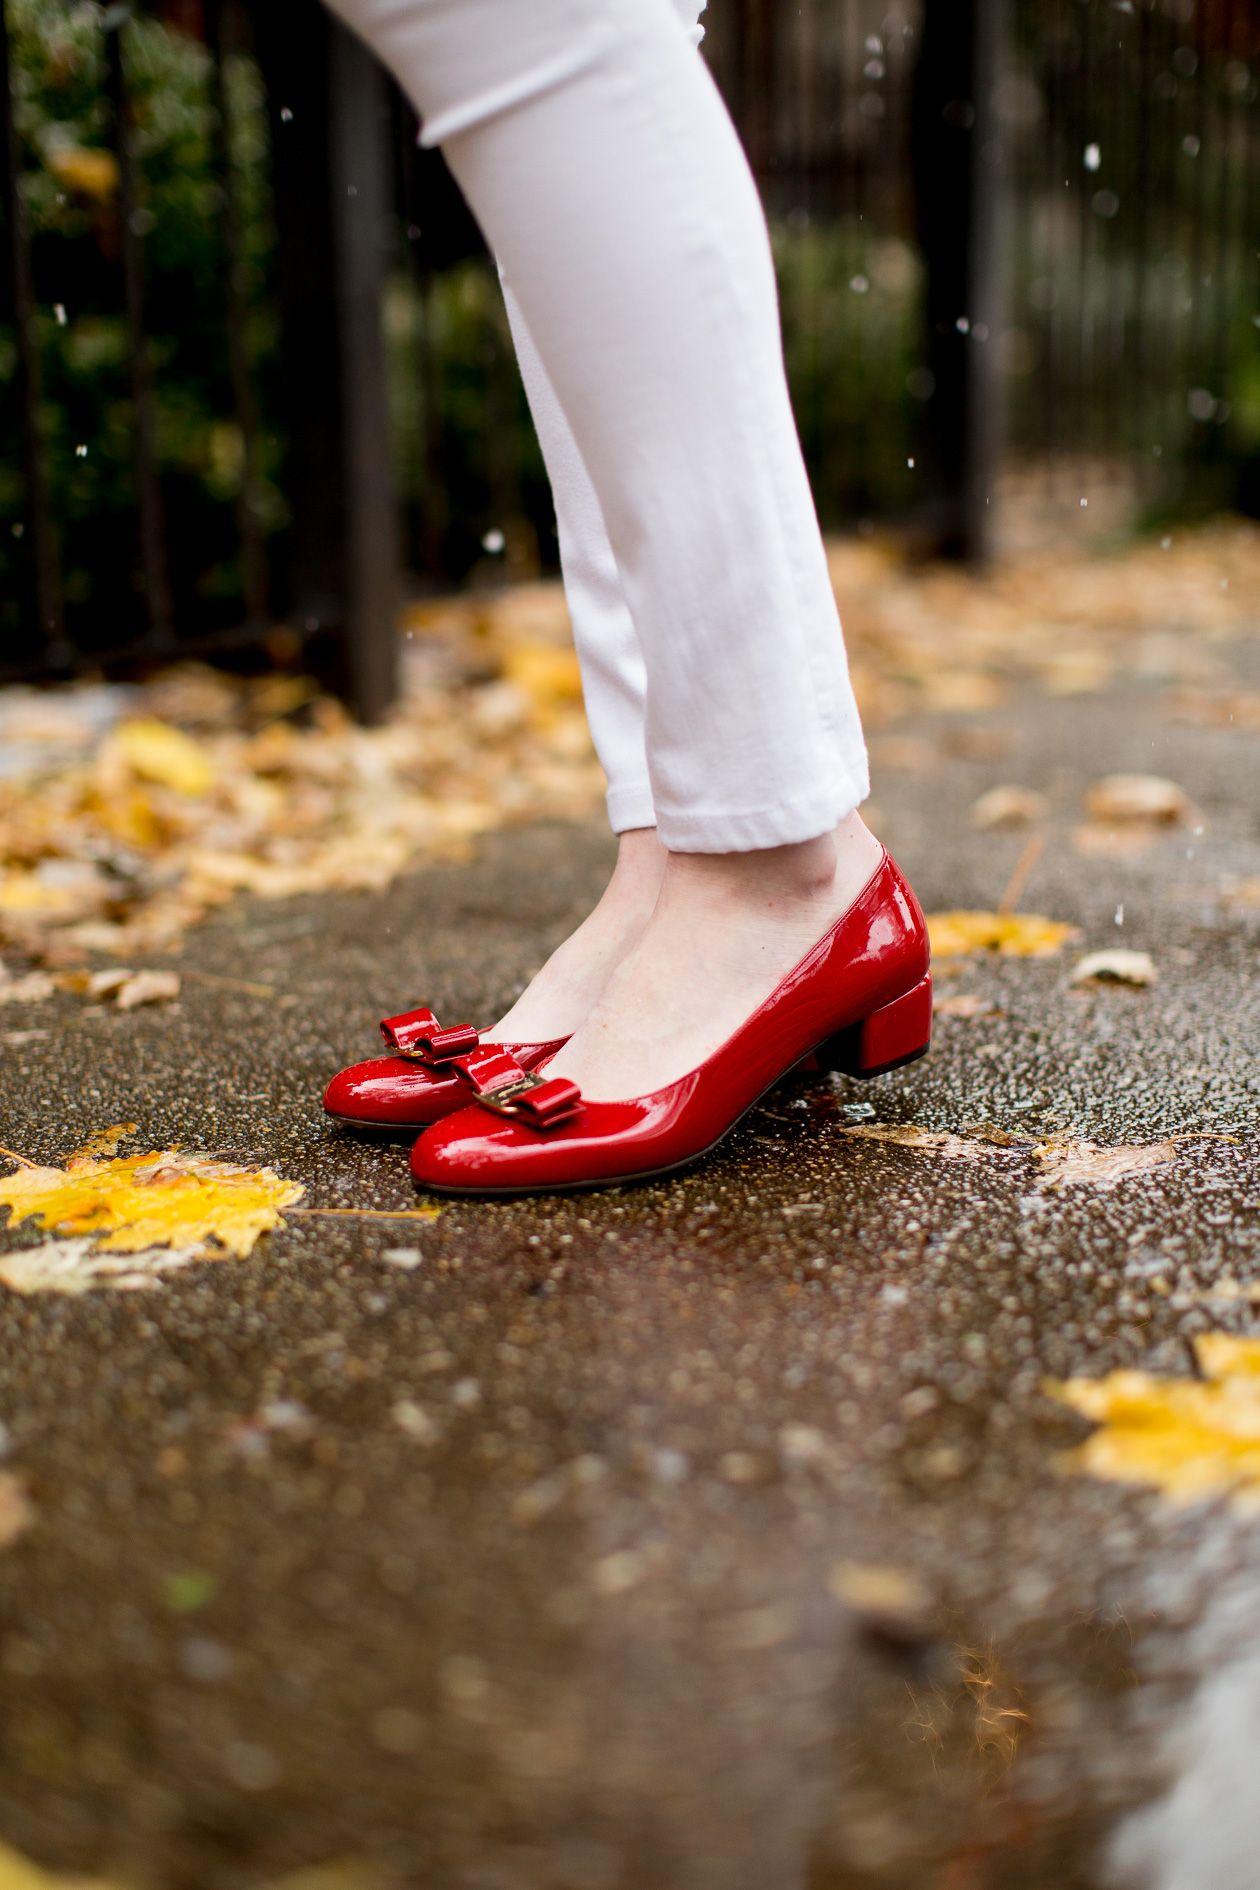 How to ferragamo wear vara shoes photos